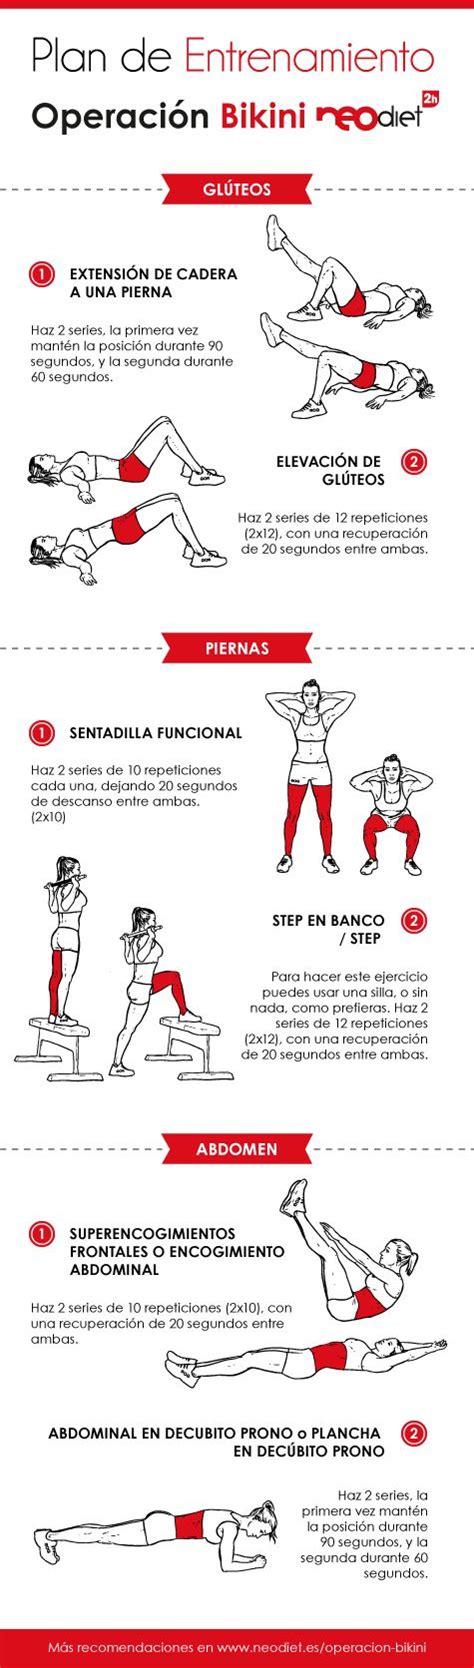 Plan de entrenamiento neodiet2h | Nutrició i exercici ...